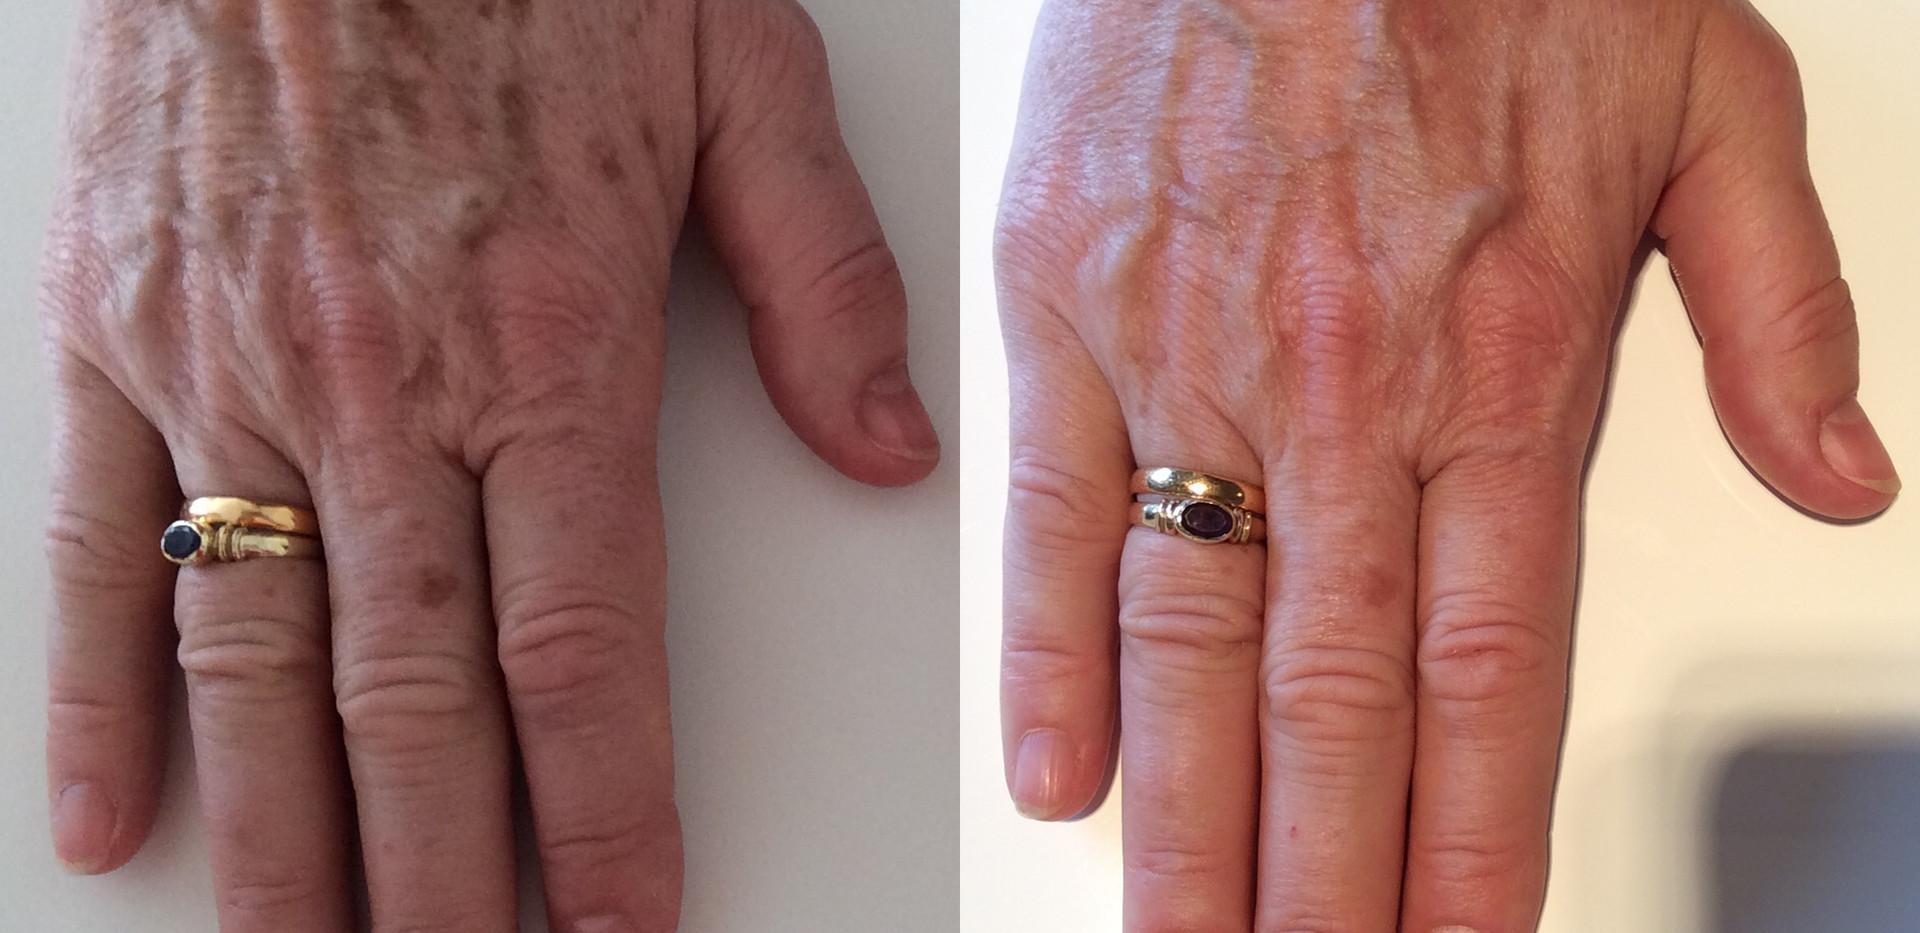 Lumecca Hands.jpg